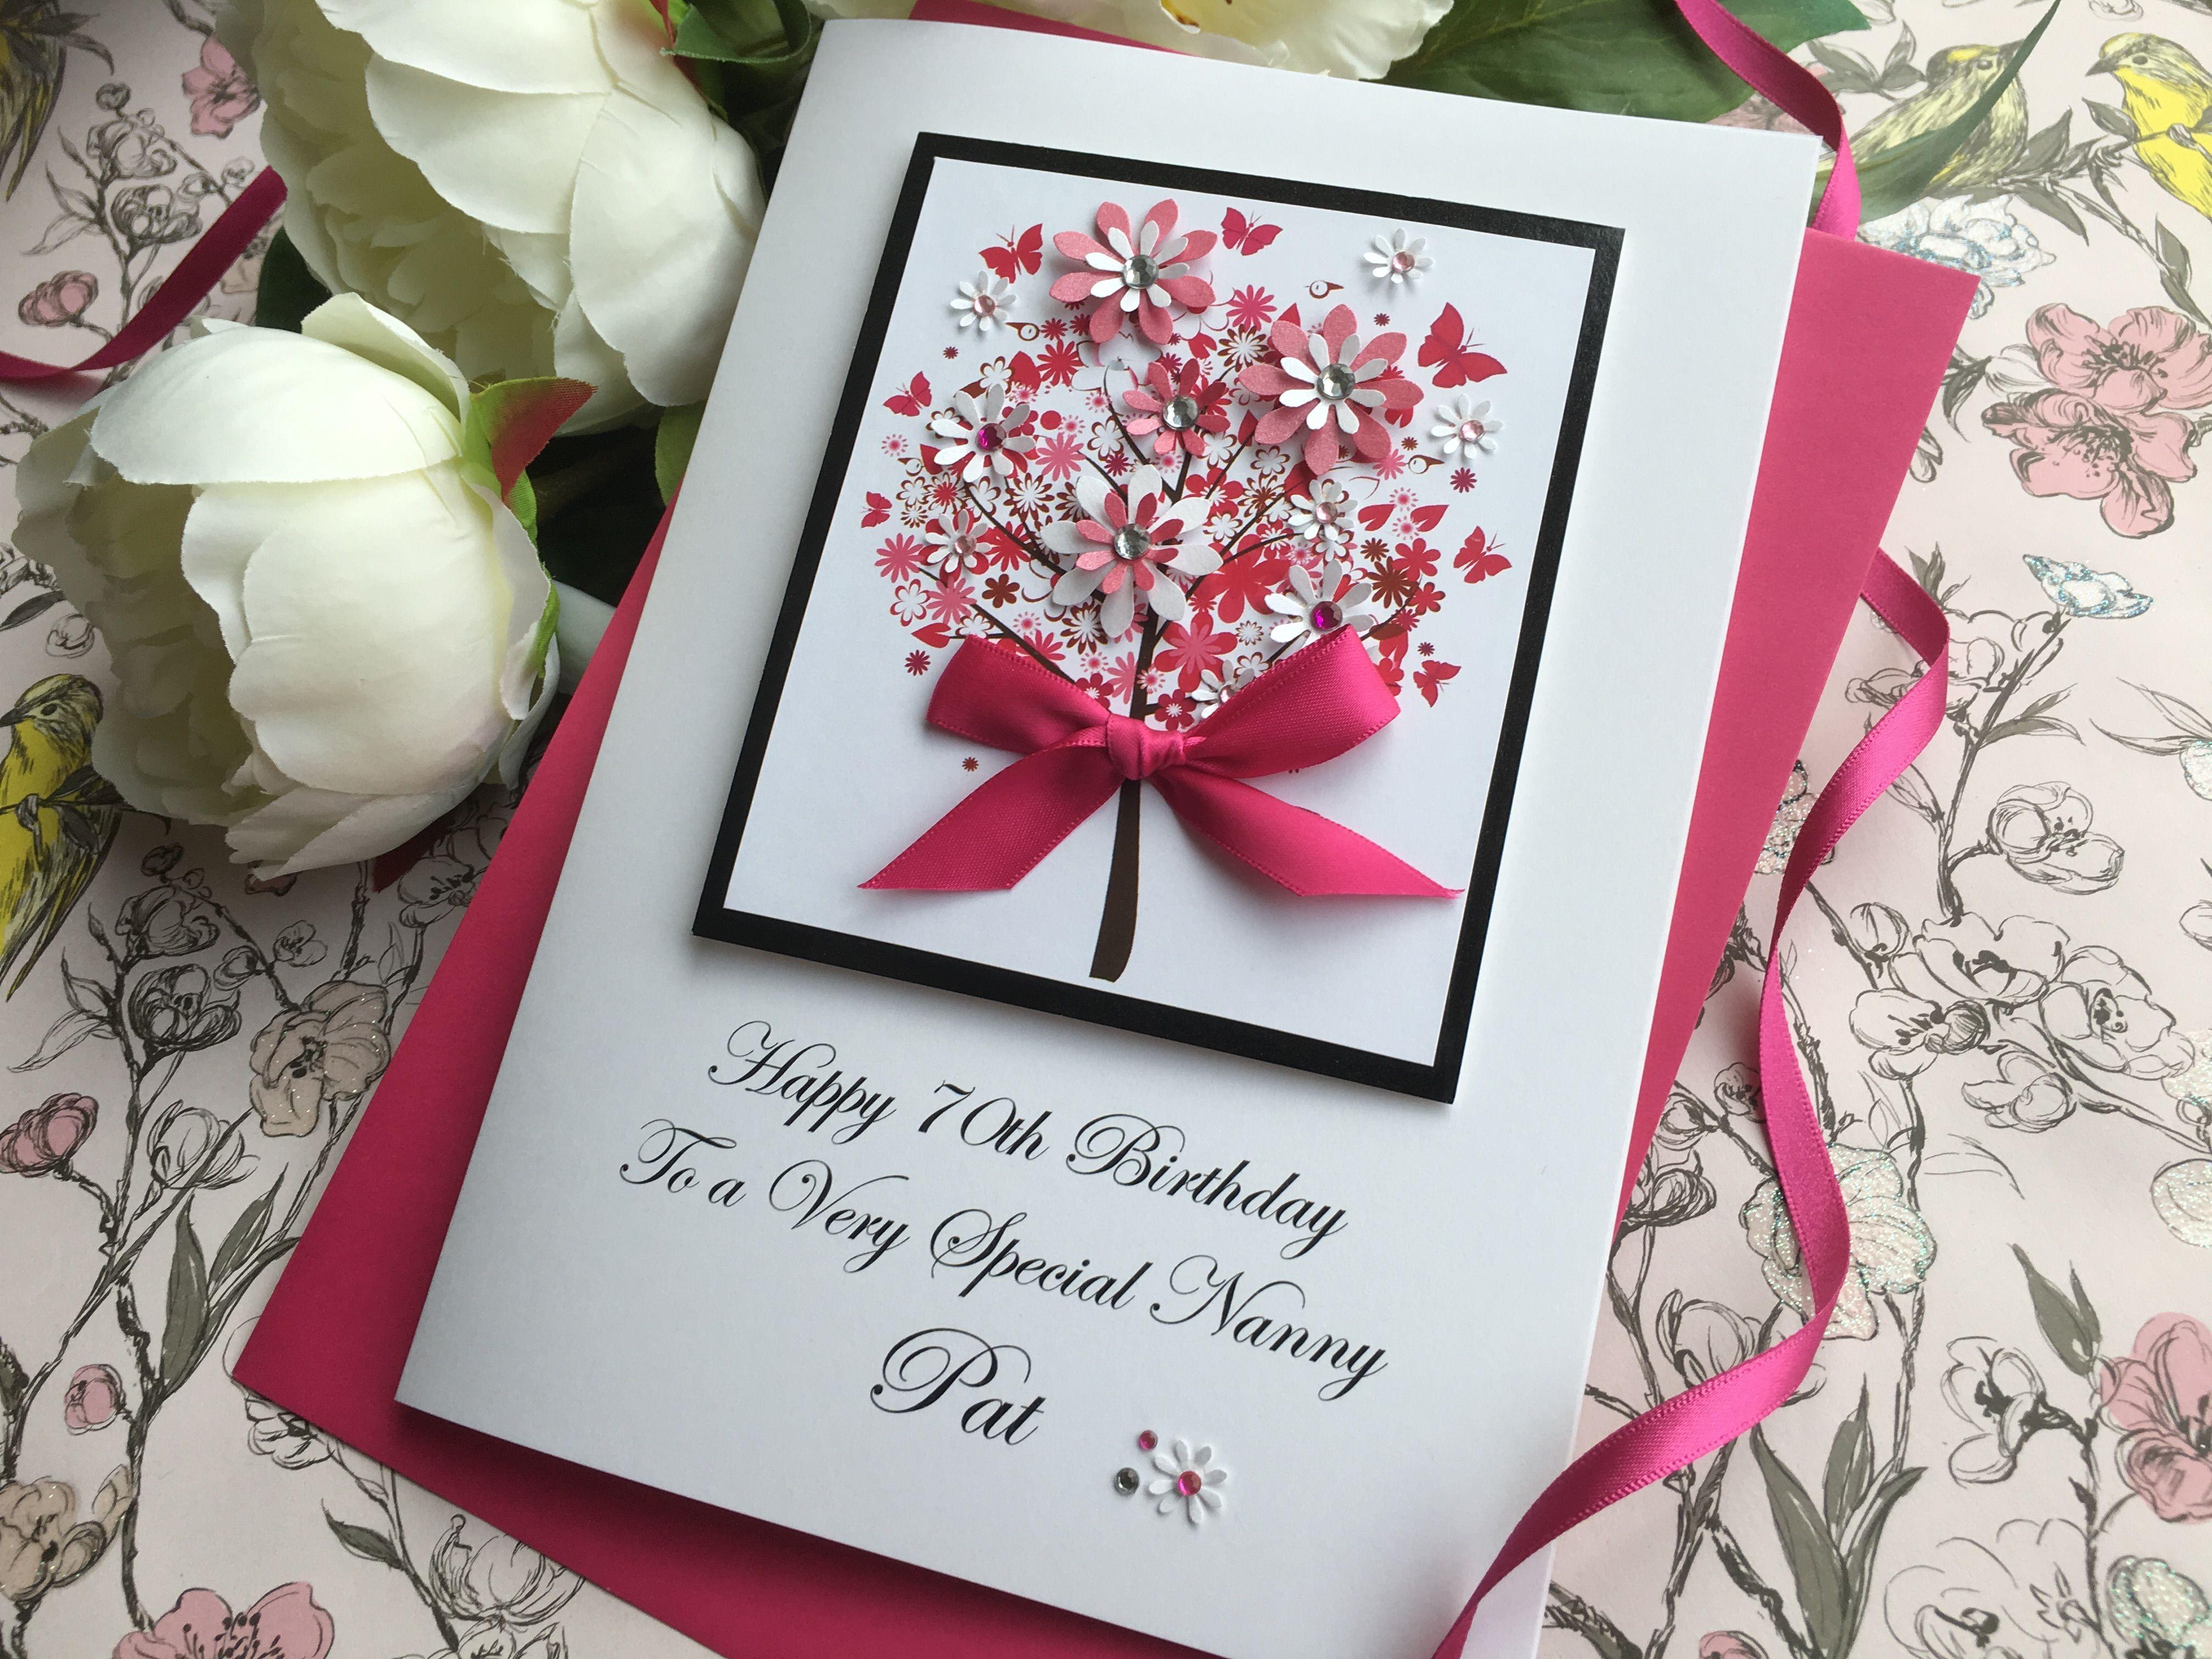 Luxury Birthday Cards Handmade Cards Luxury Birthday Cards Handmade Birthday Cards Homemade Birthday Cards